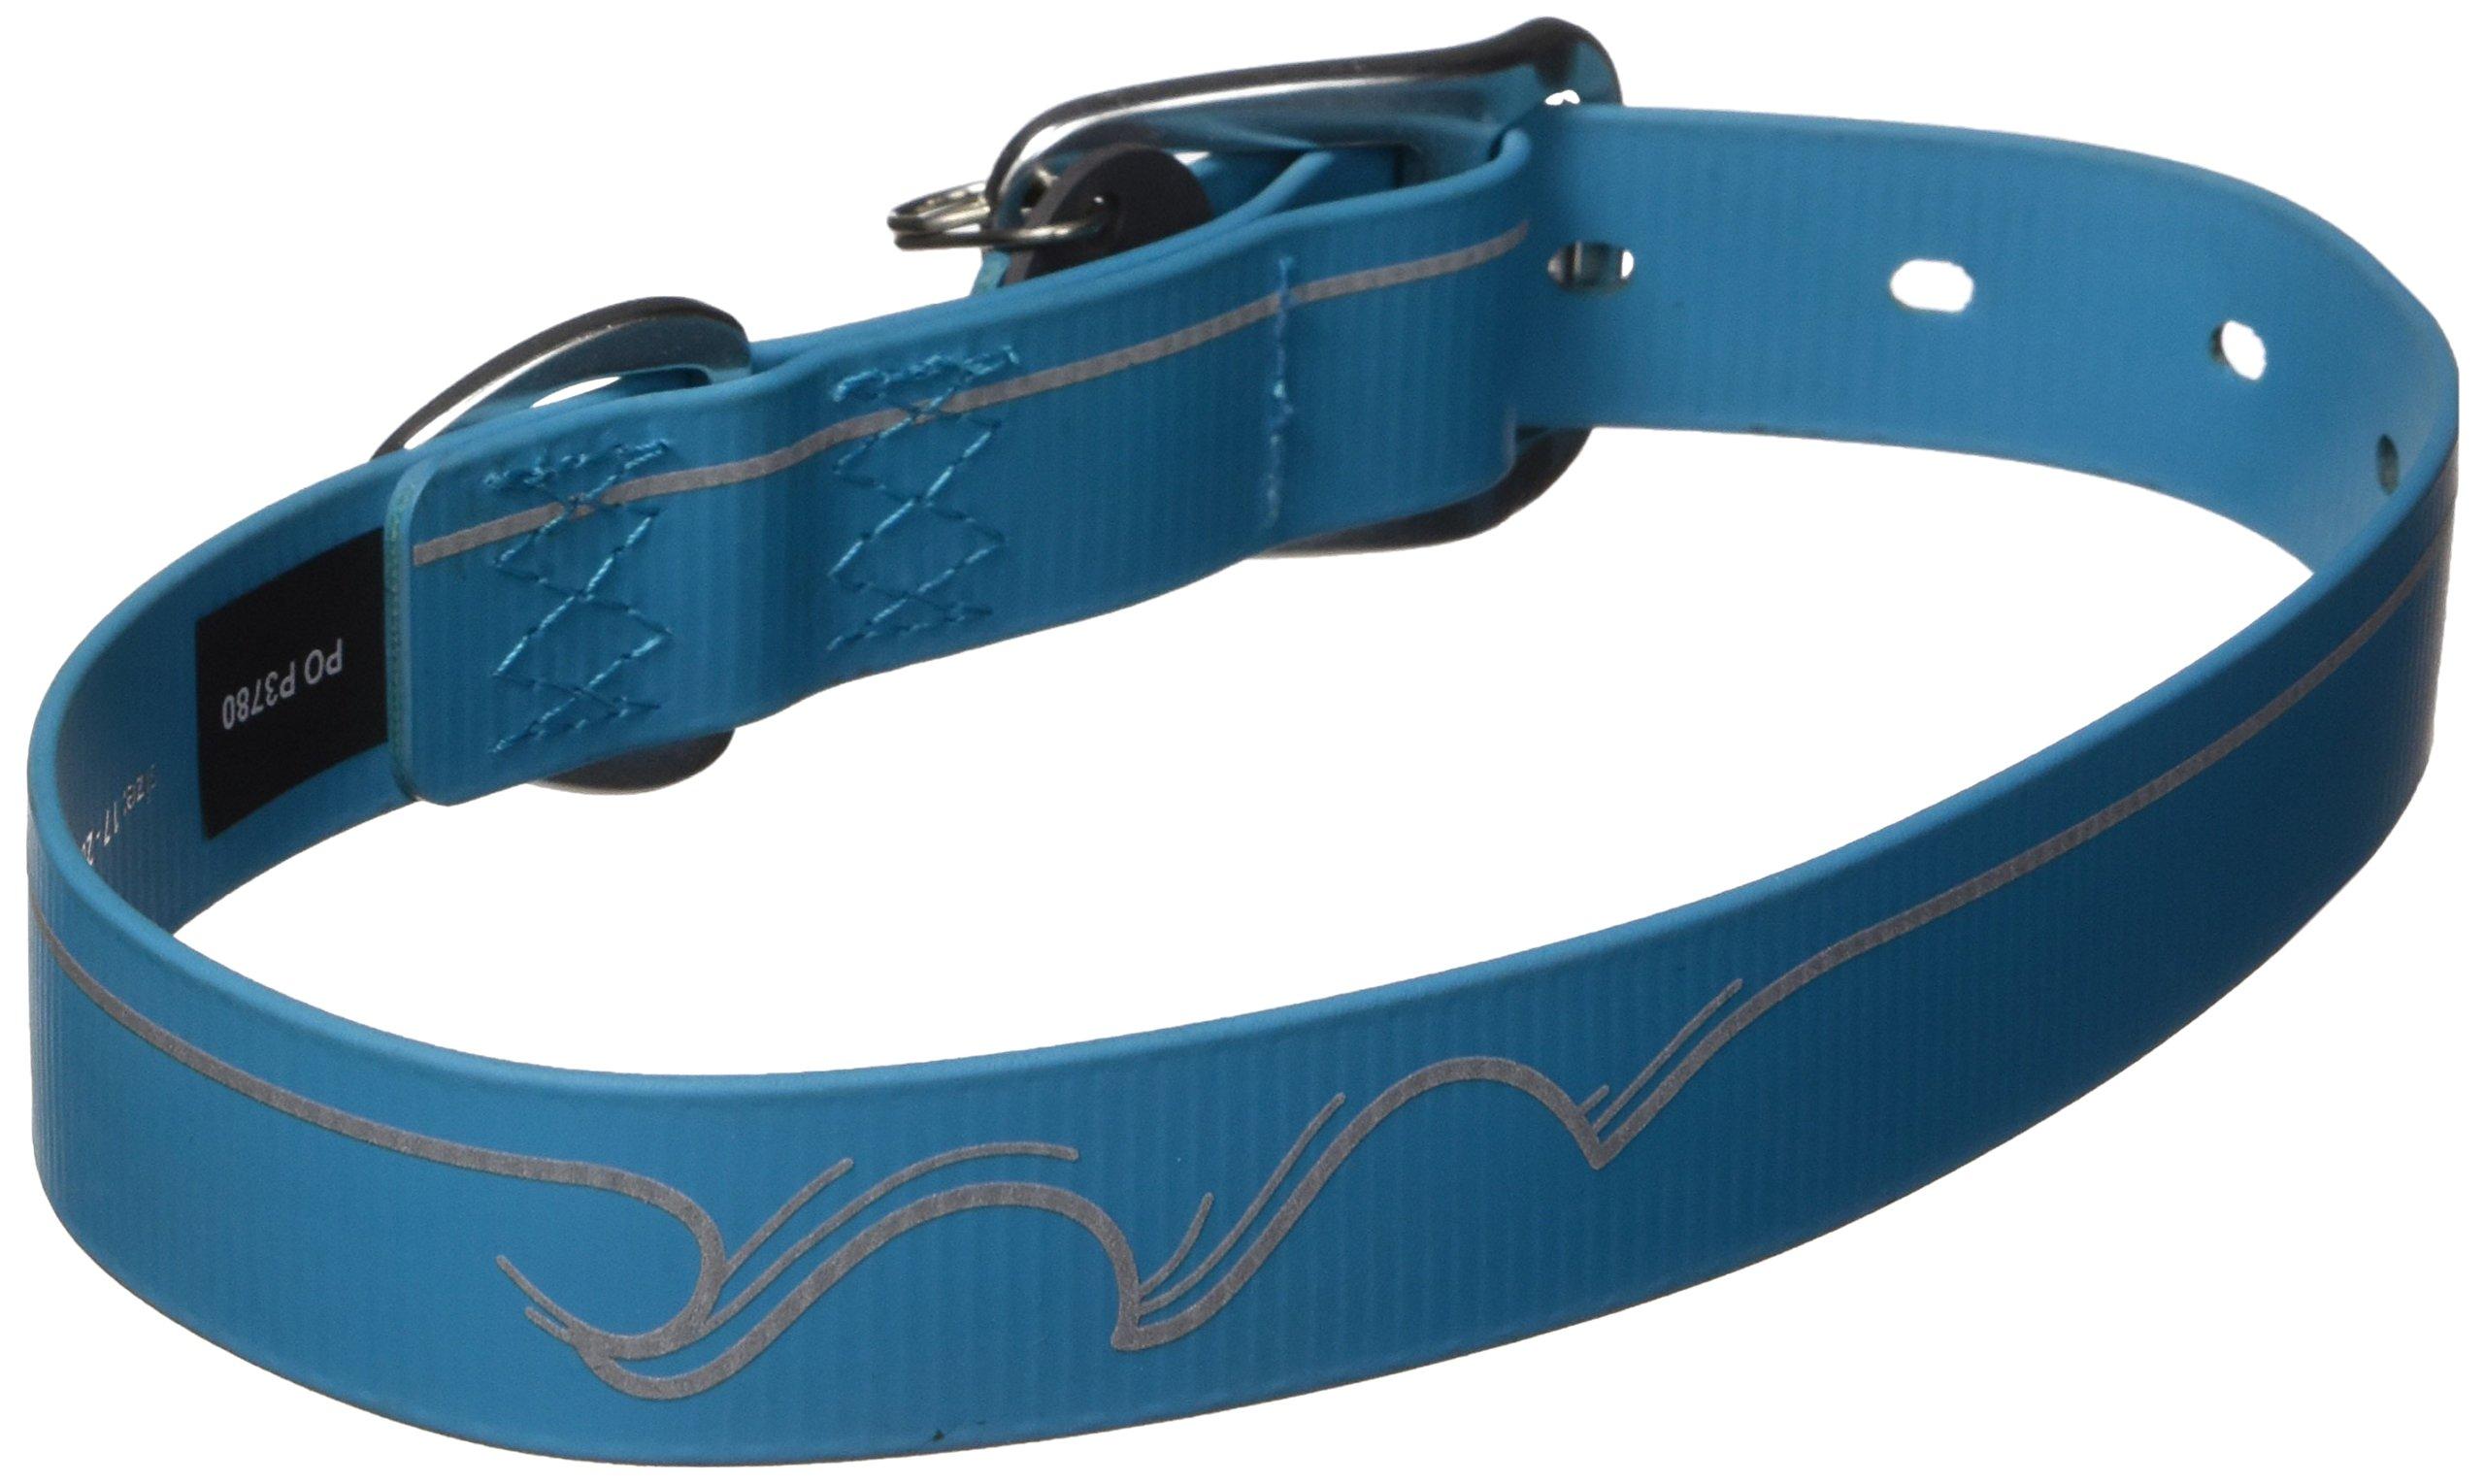 RUFFWEAR - Headwater Waterproof, Stink-Proof, Reflective Dog Collar, Blue Spring, 17''-20''